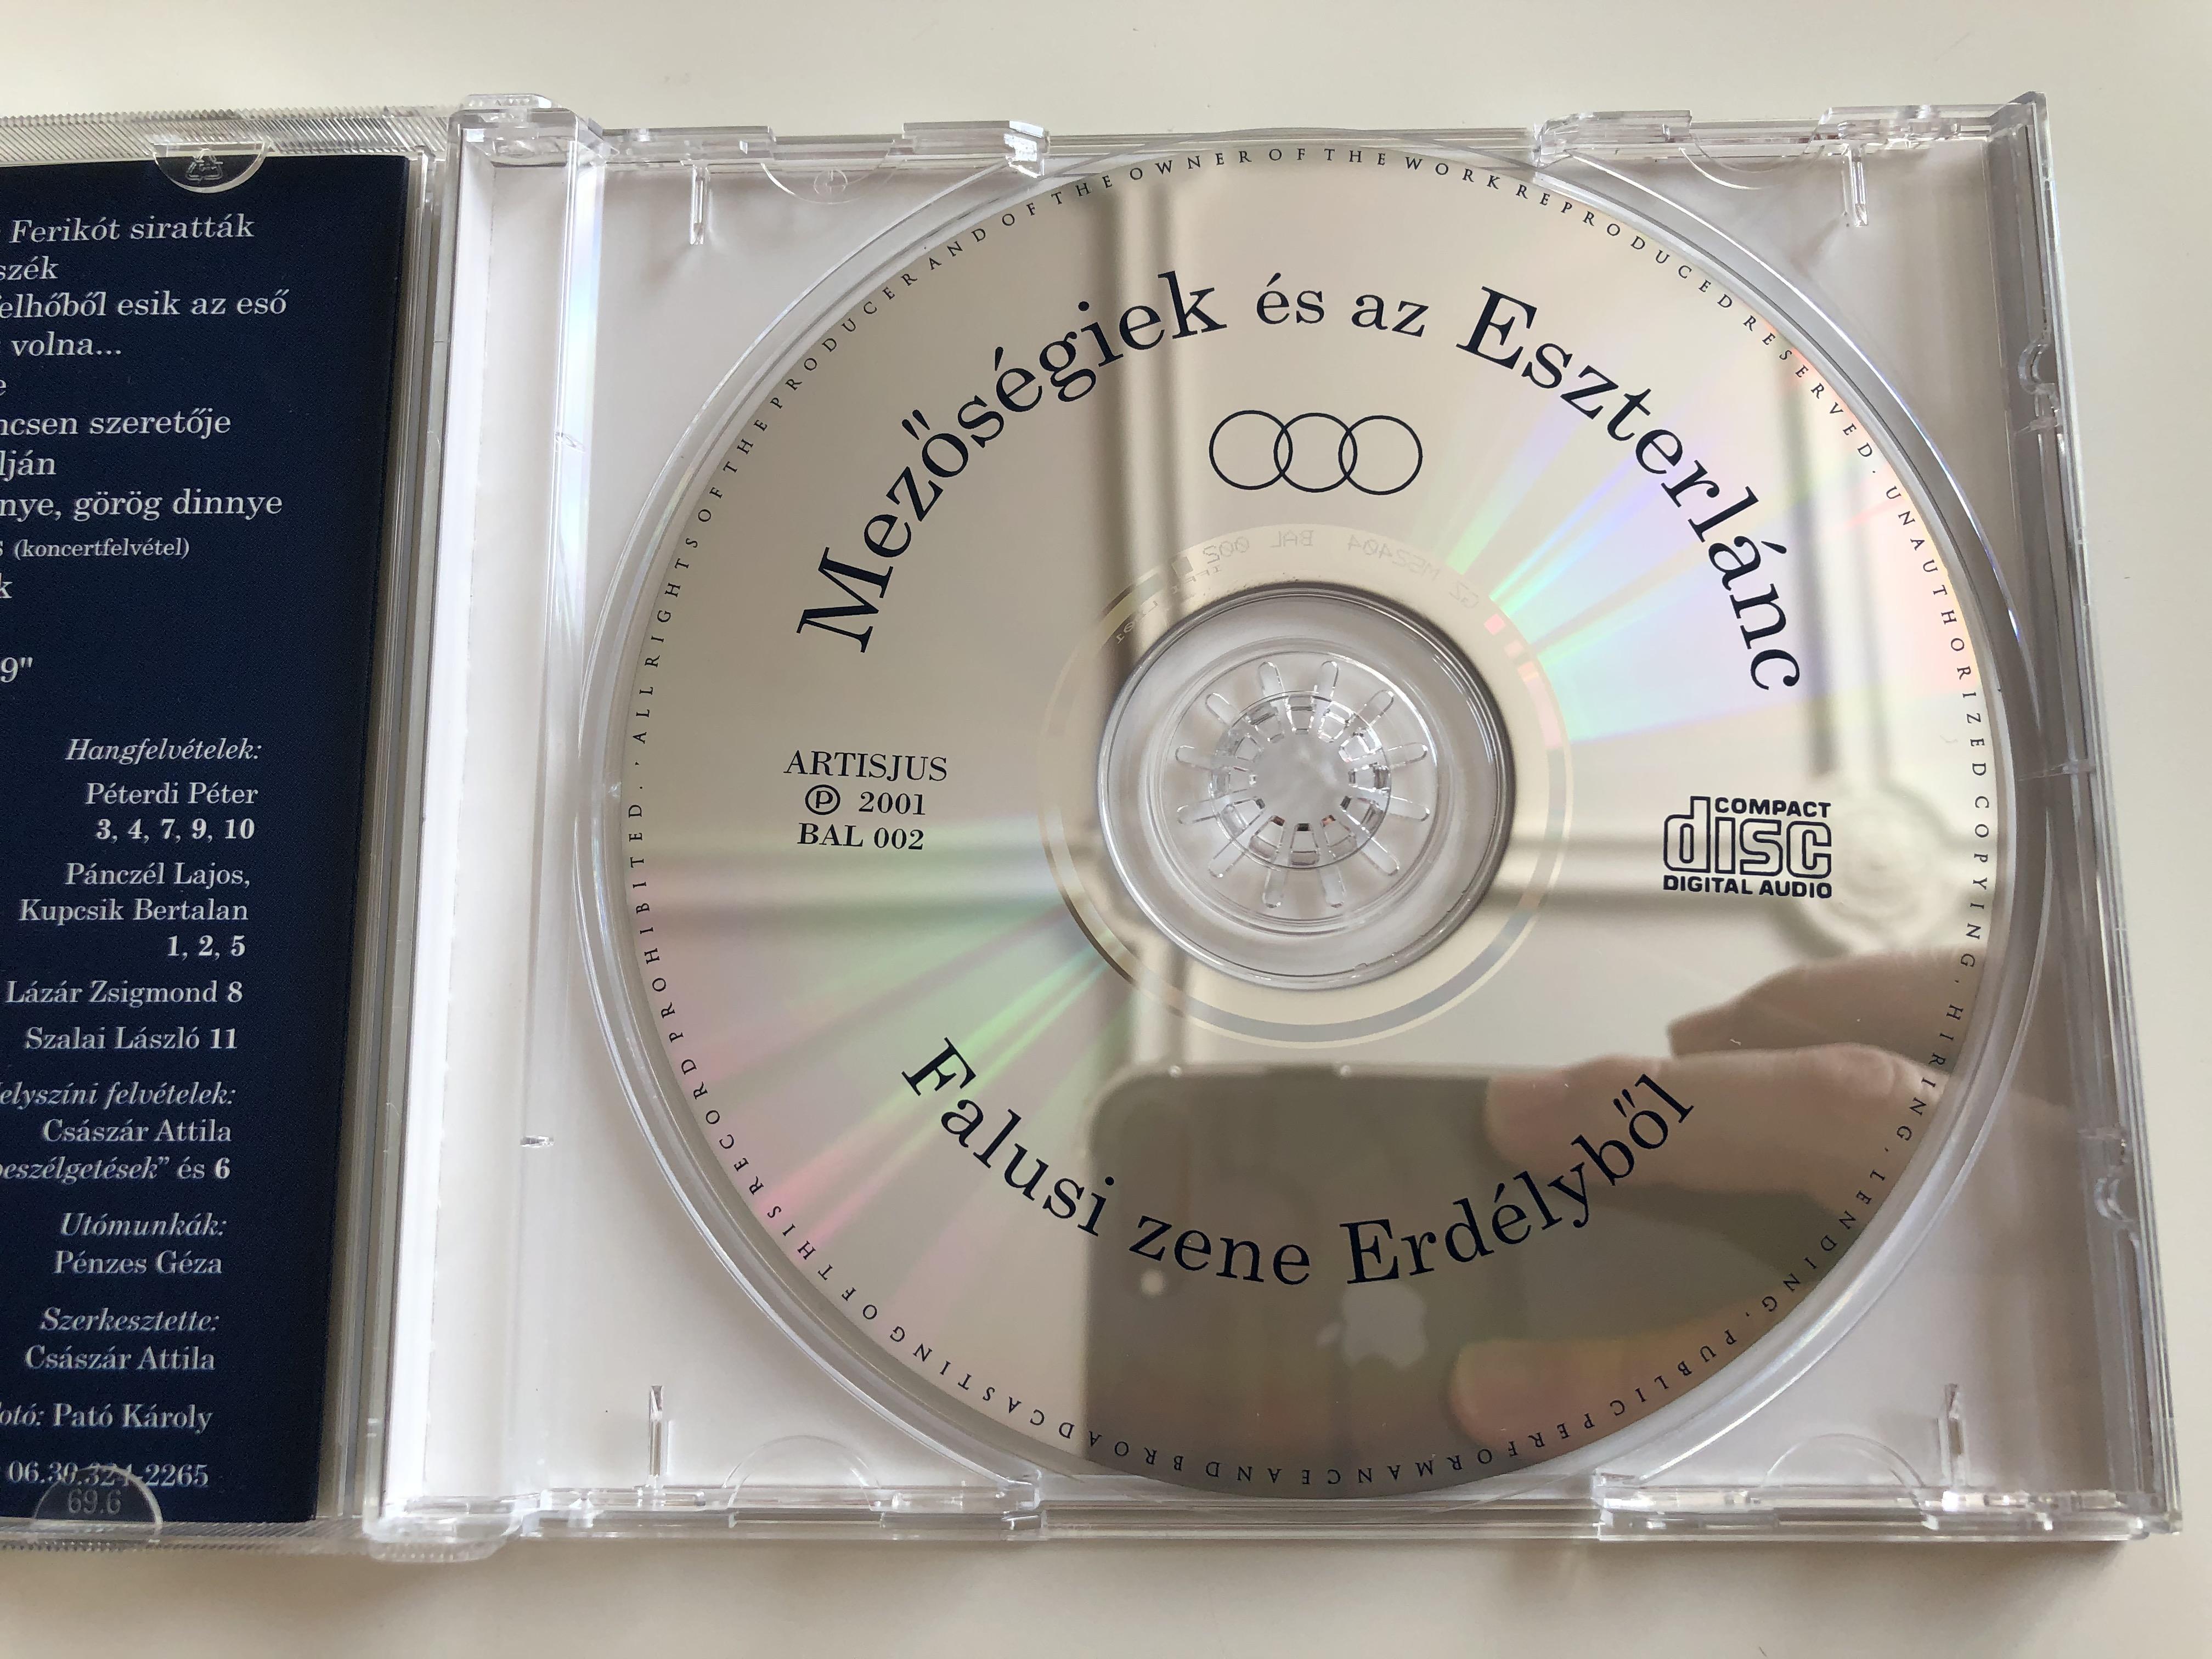 mez-s-giek-s-az-eszterl-nc-traditional-hungarian-music-from-transylvania-fon-records-audio-cd-2001-bal-002-4-.jpg